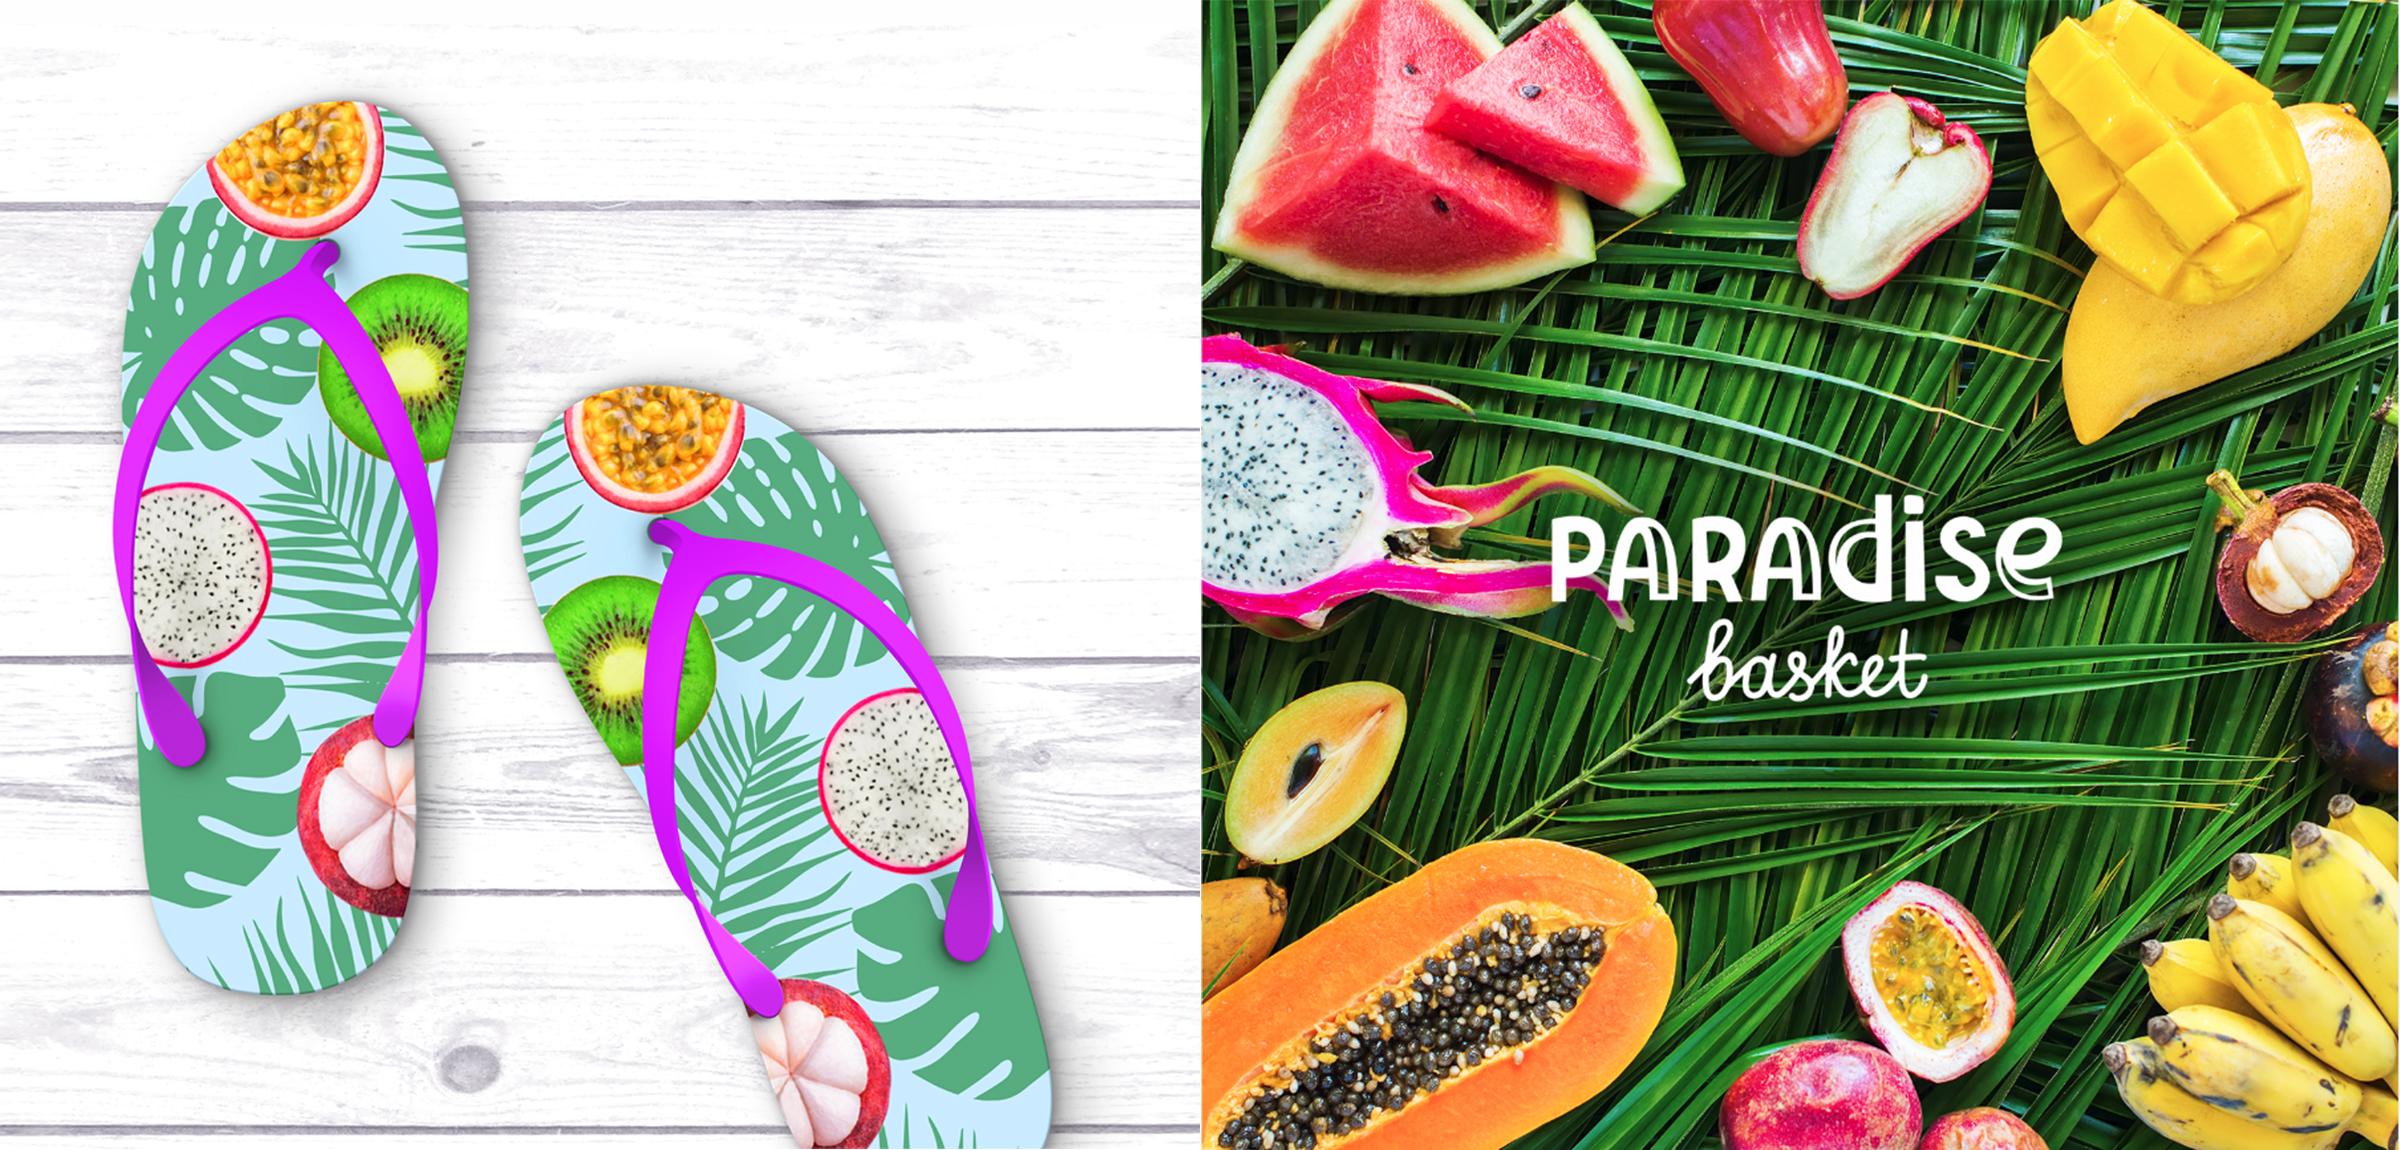 Разработка логотипа Paradise basket